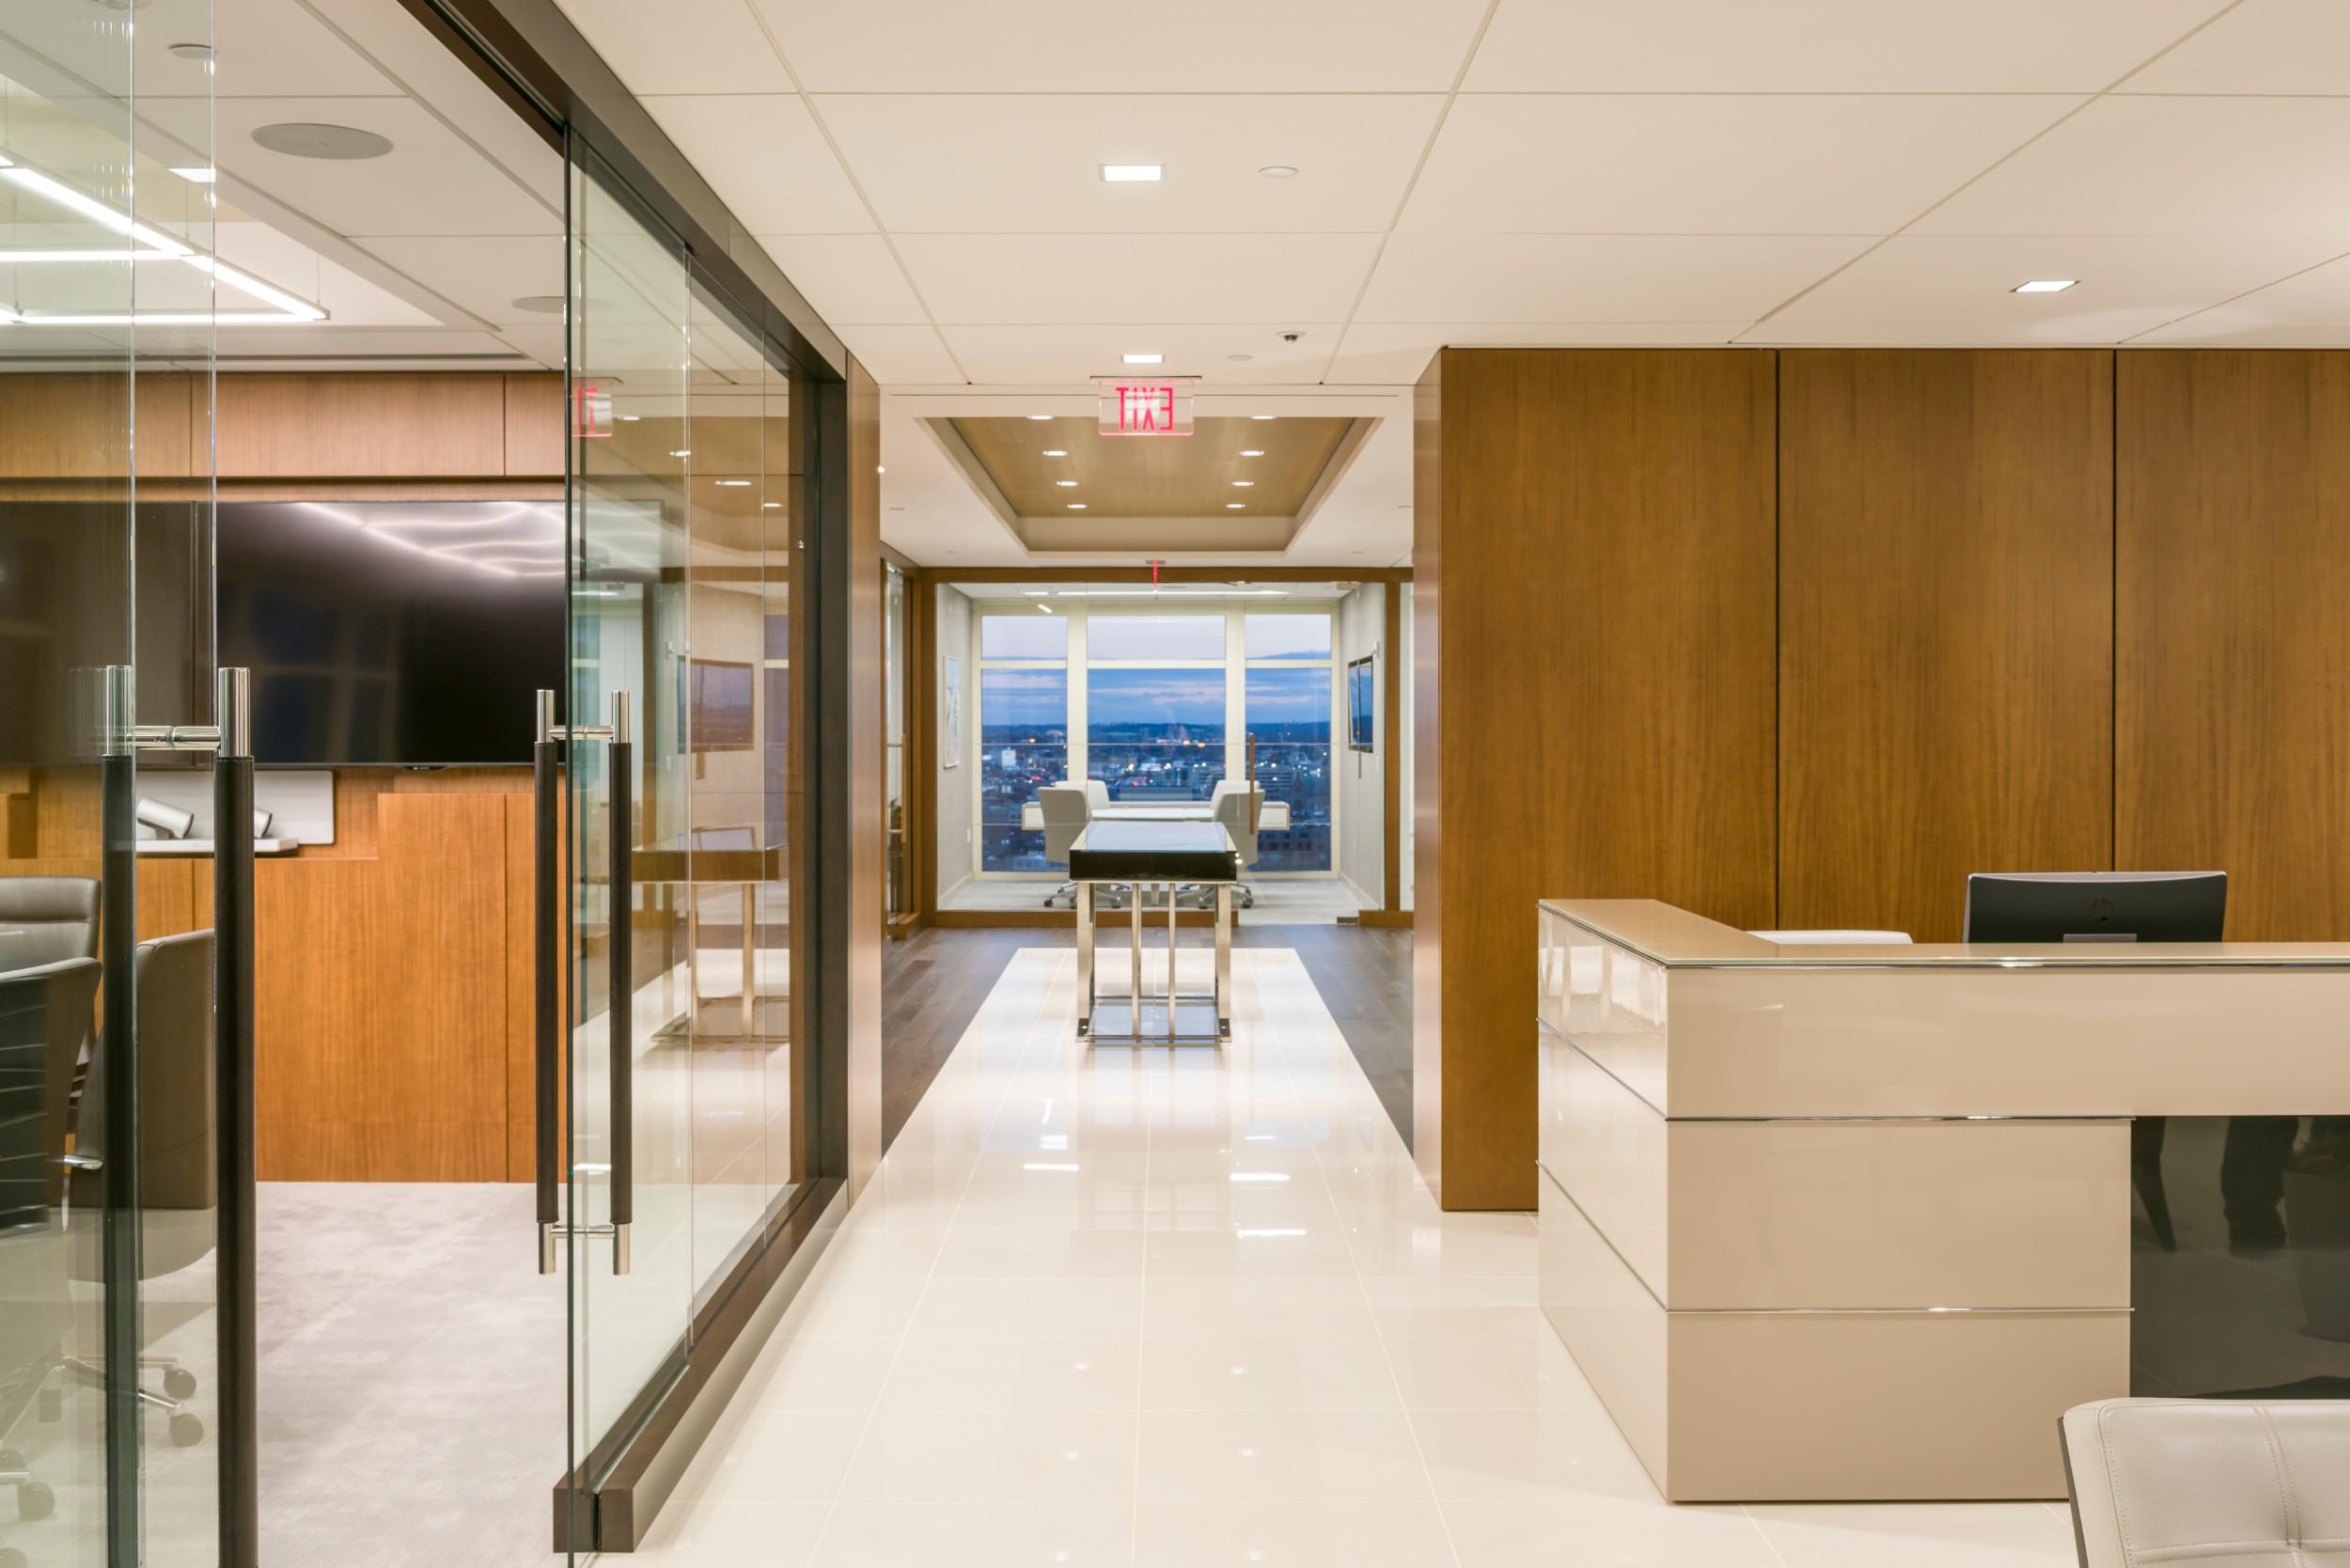 Corderman_Construction_Martignetti_Companies_Interior_Office_Buildout_Hallway_Reception_View.jpg